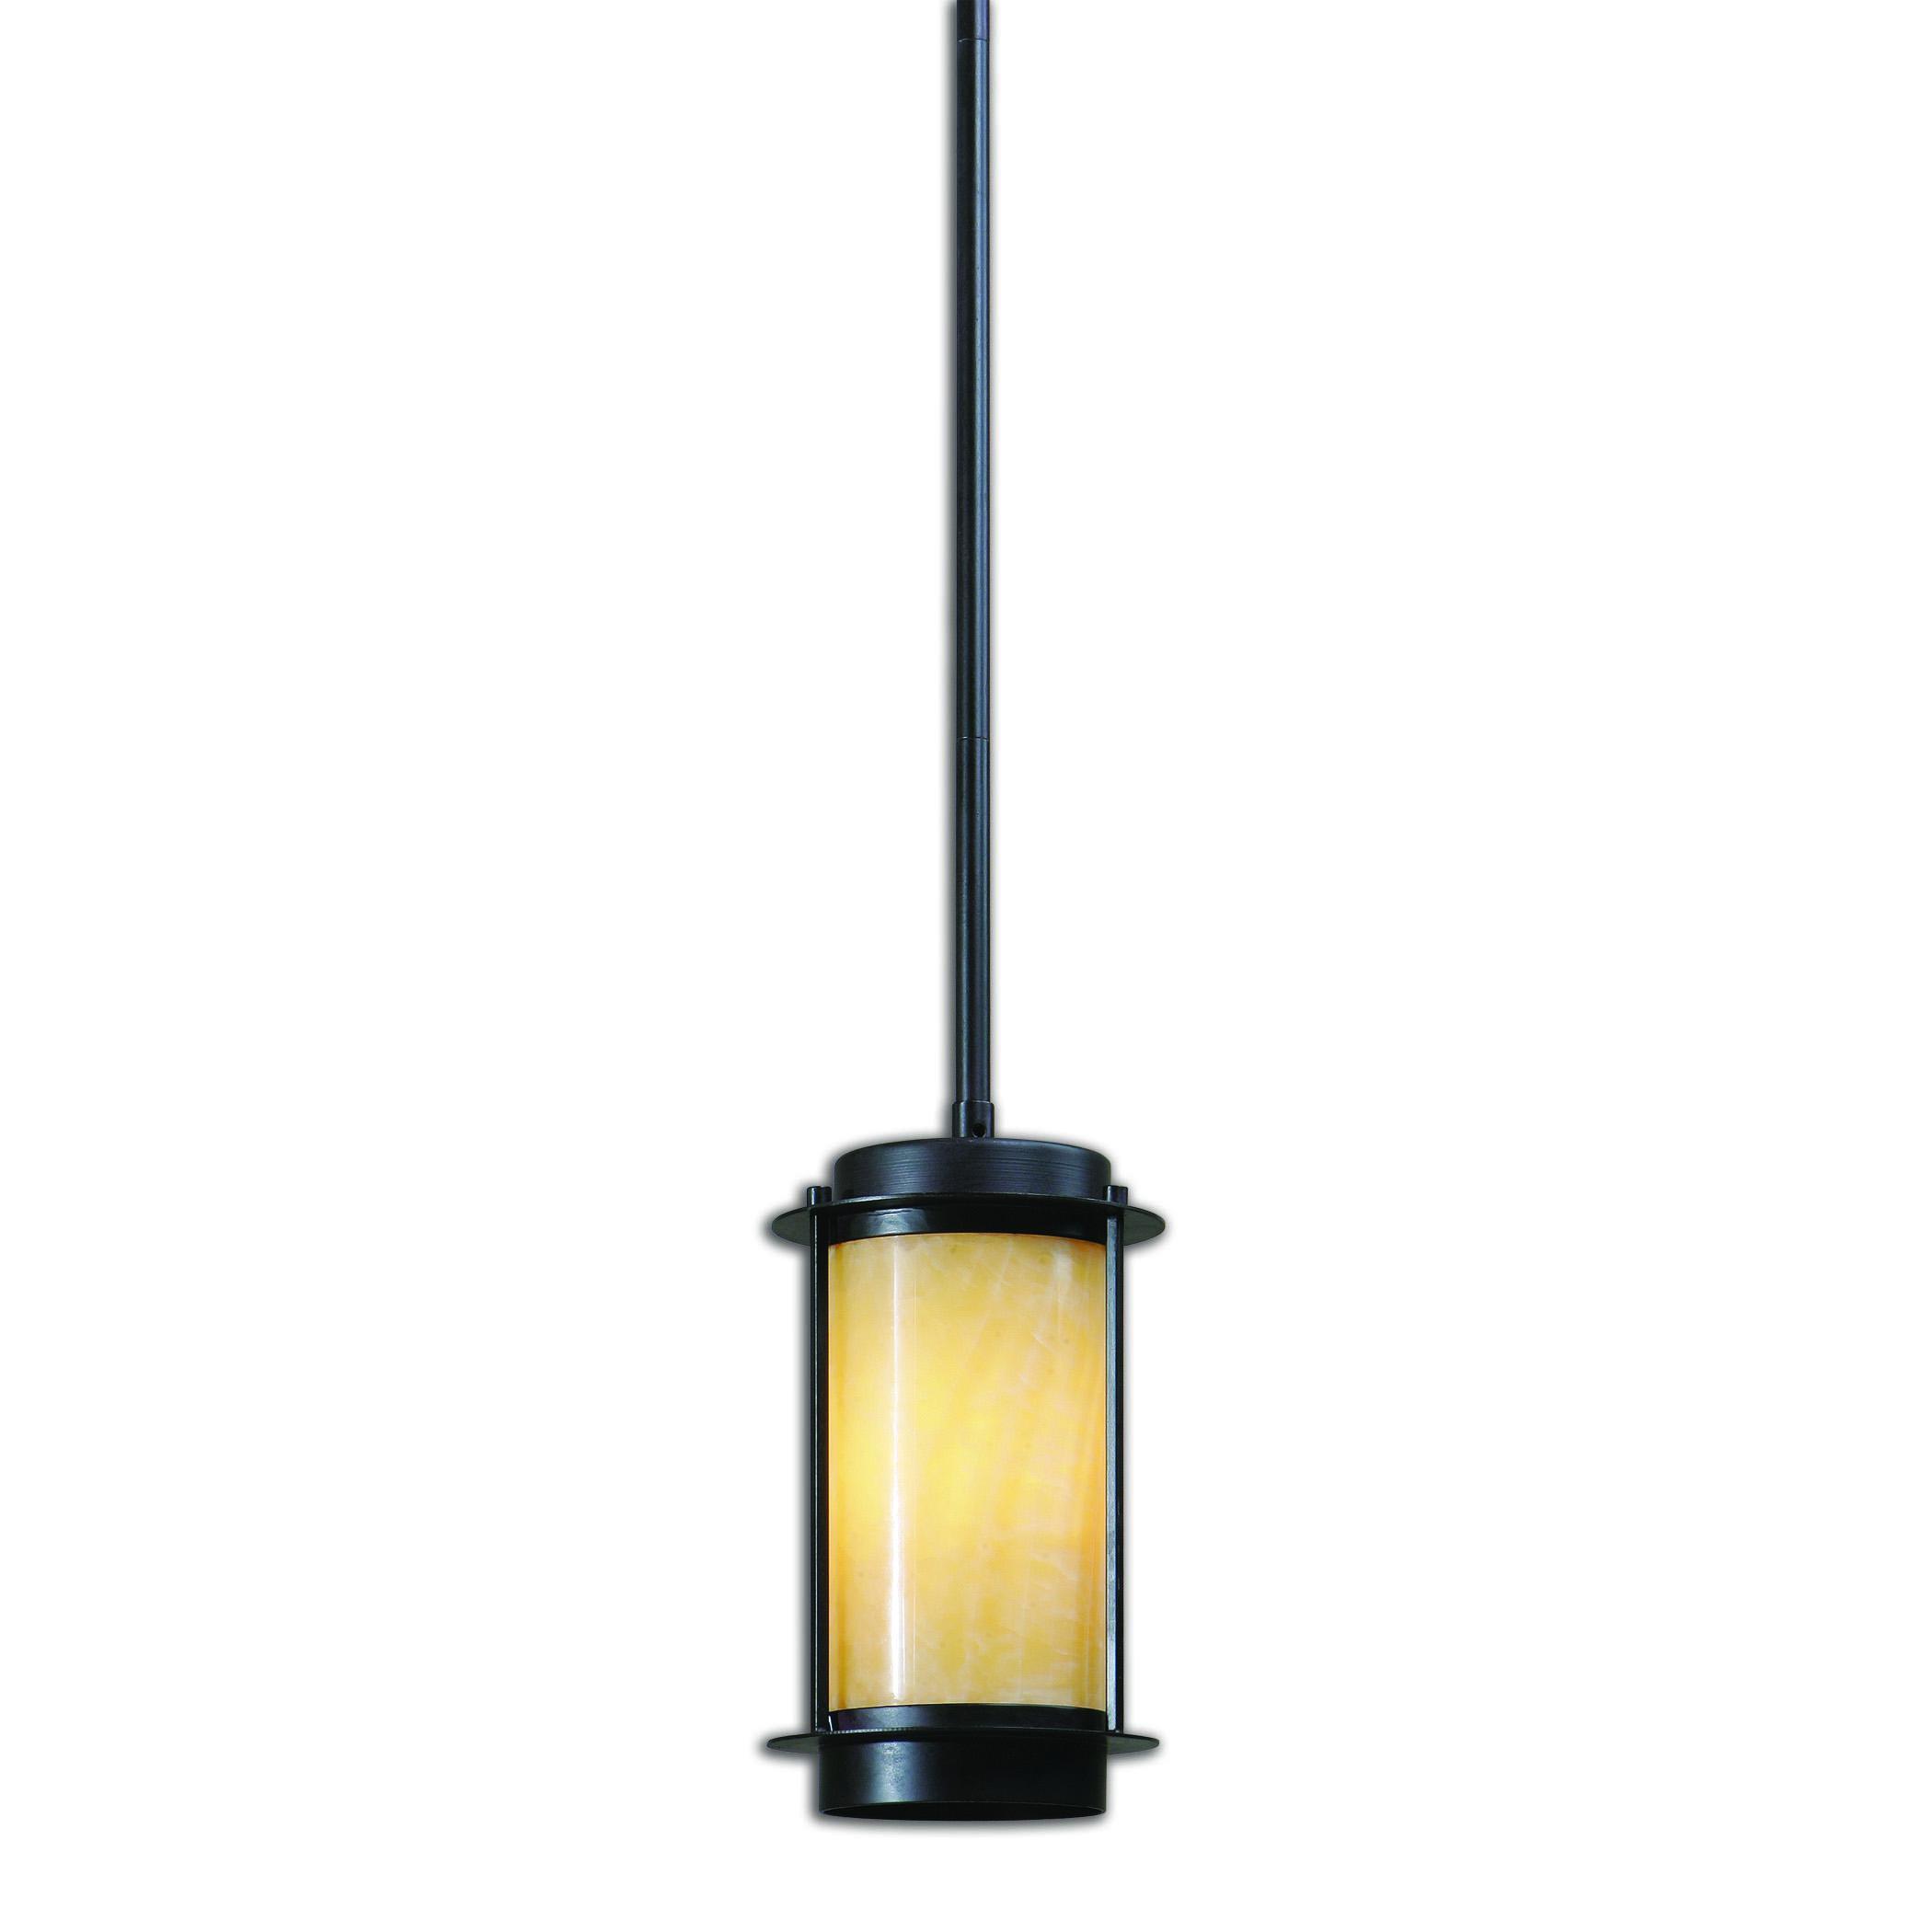 Uttermost Lighting Fixtures Uttermost Dolcezza 1 Light Bronze Mini Penda - Item Number: 22030